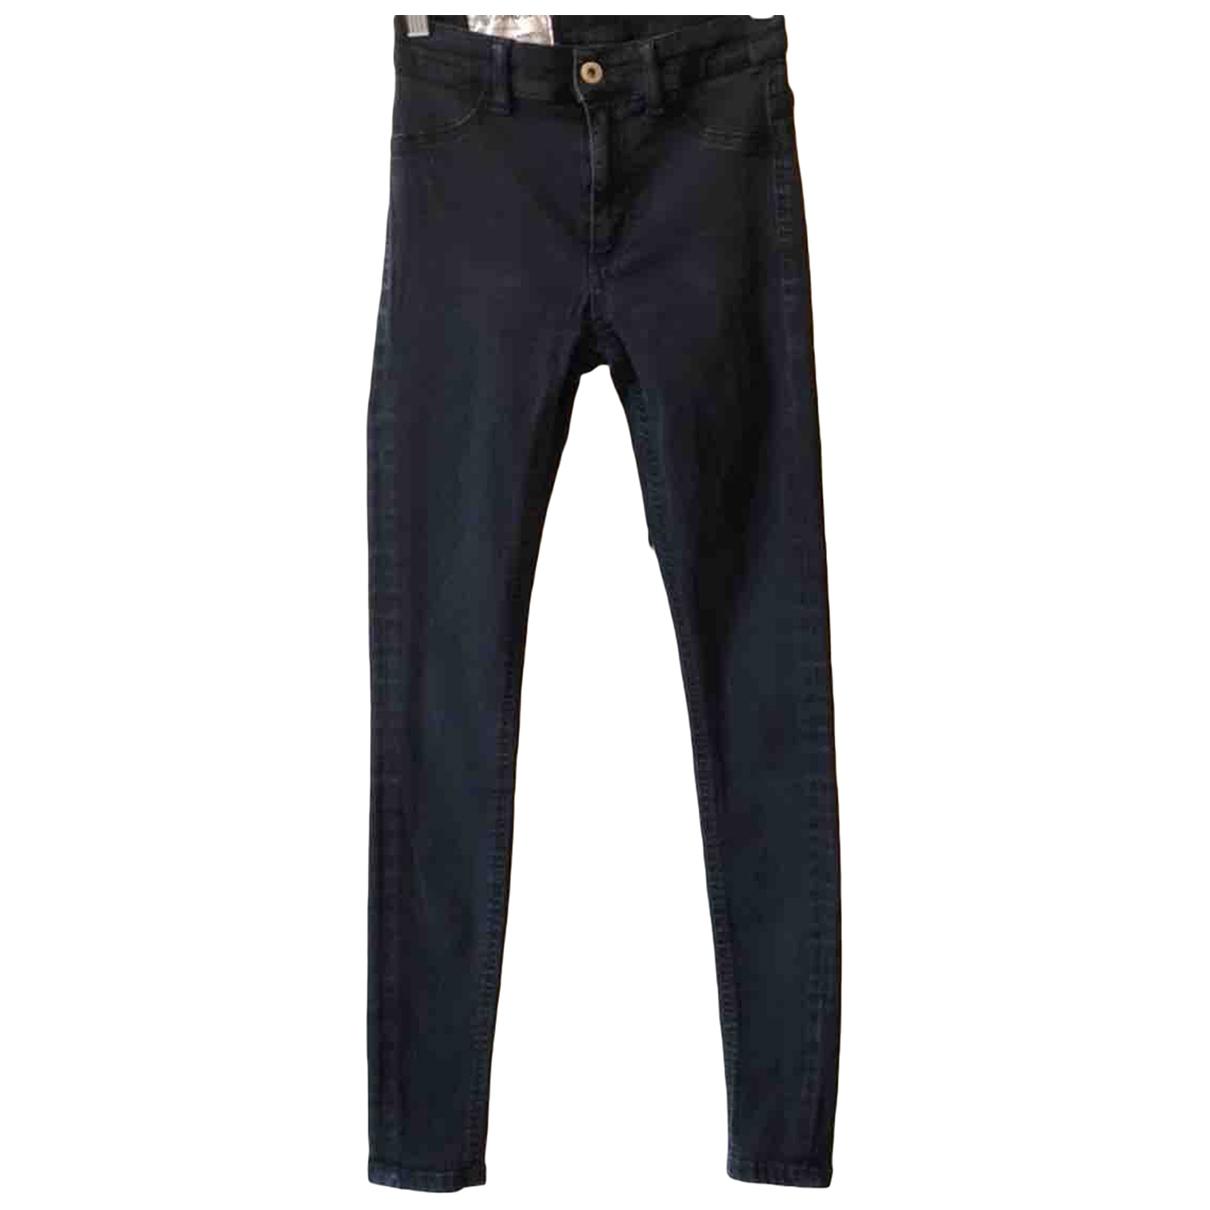 Dondup \N Black Cotton Trousers for Women 38 IT